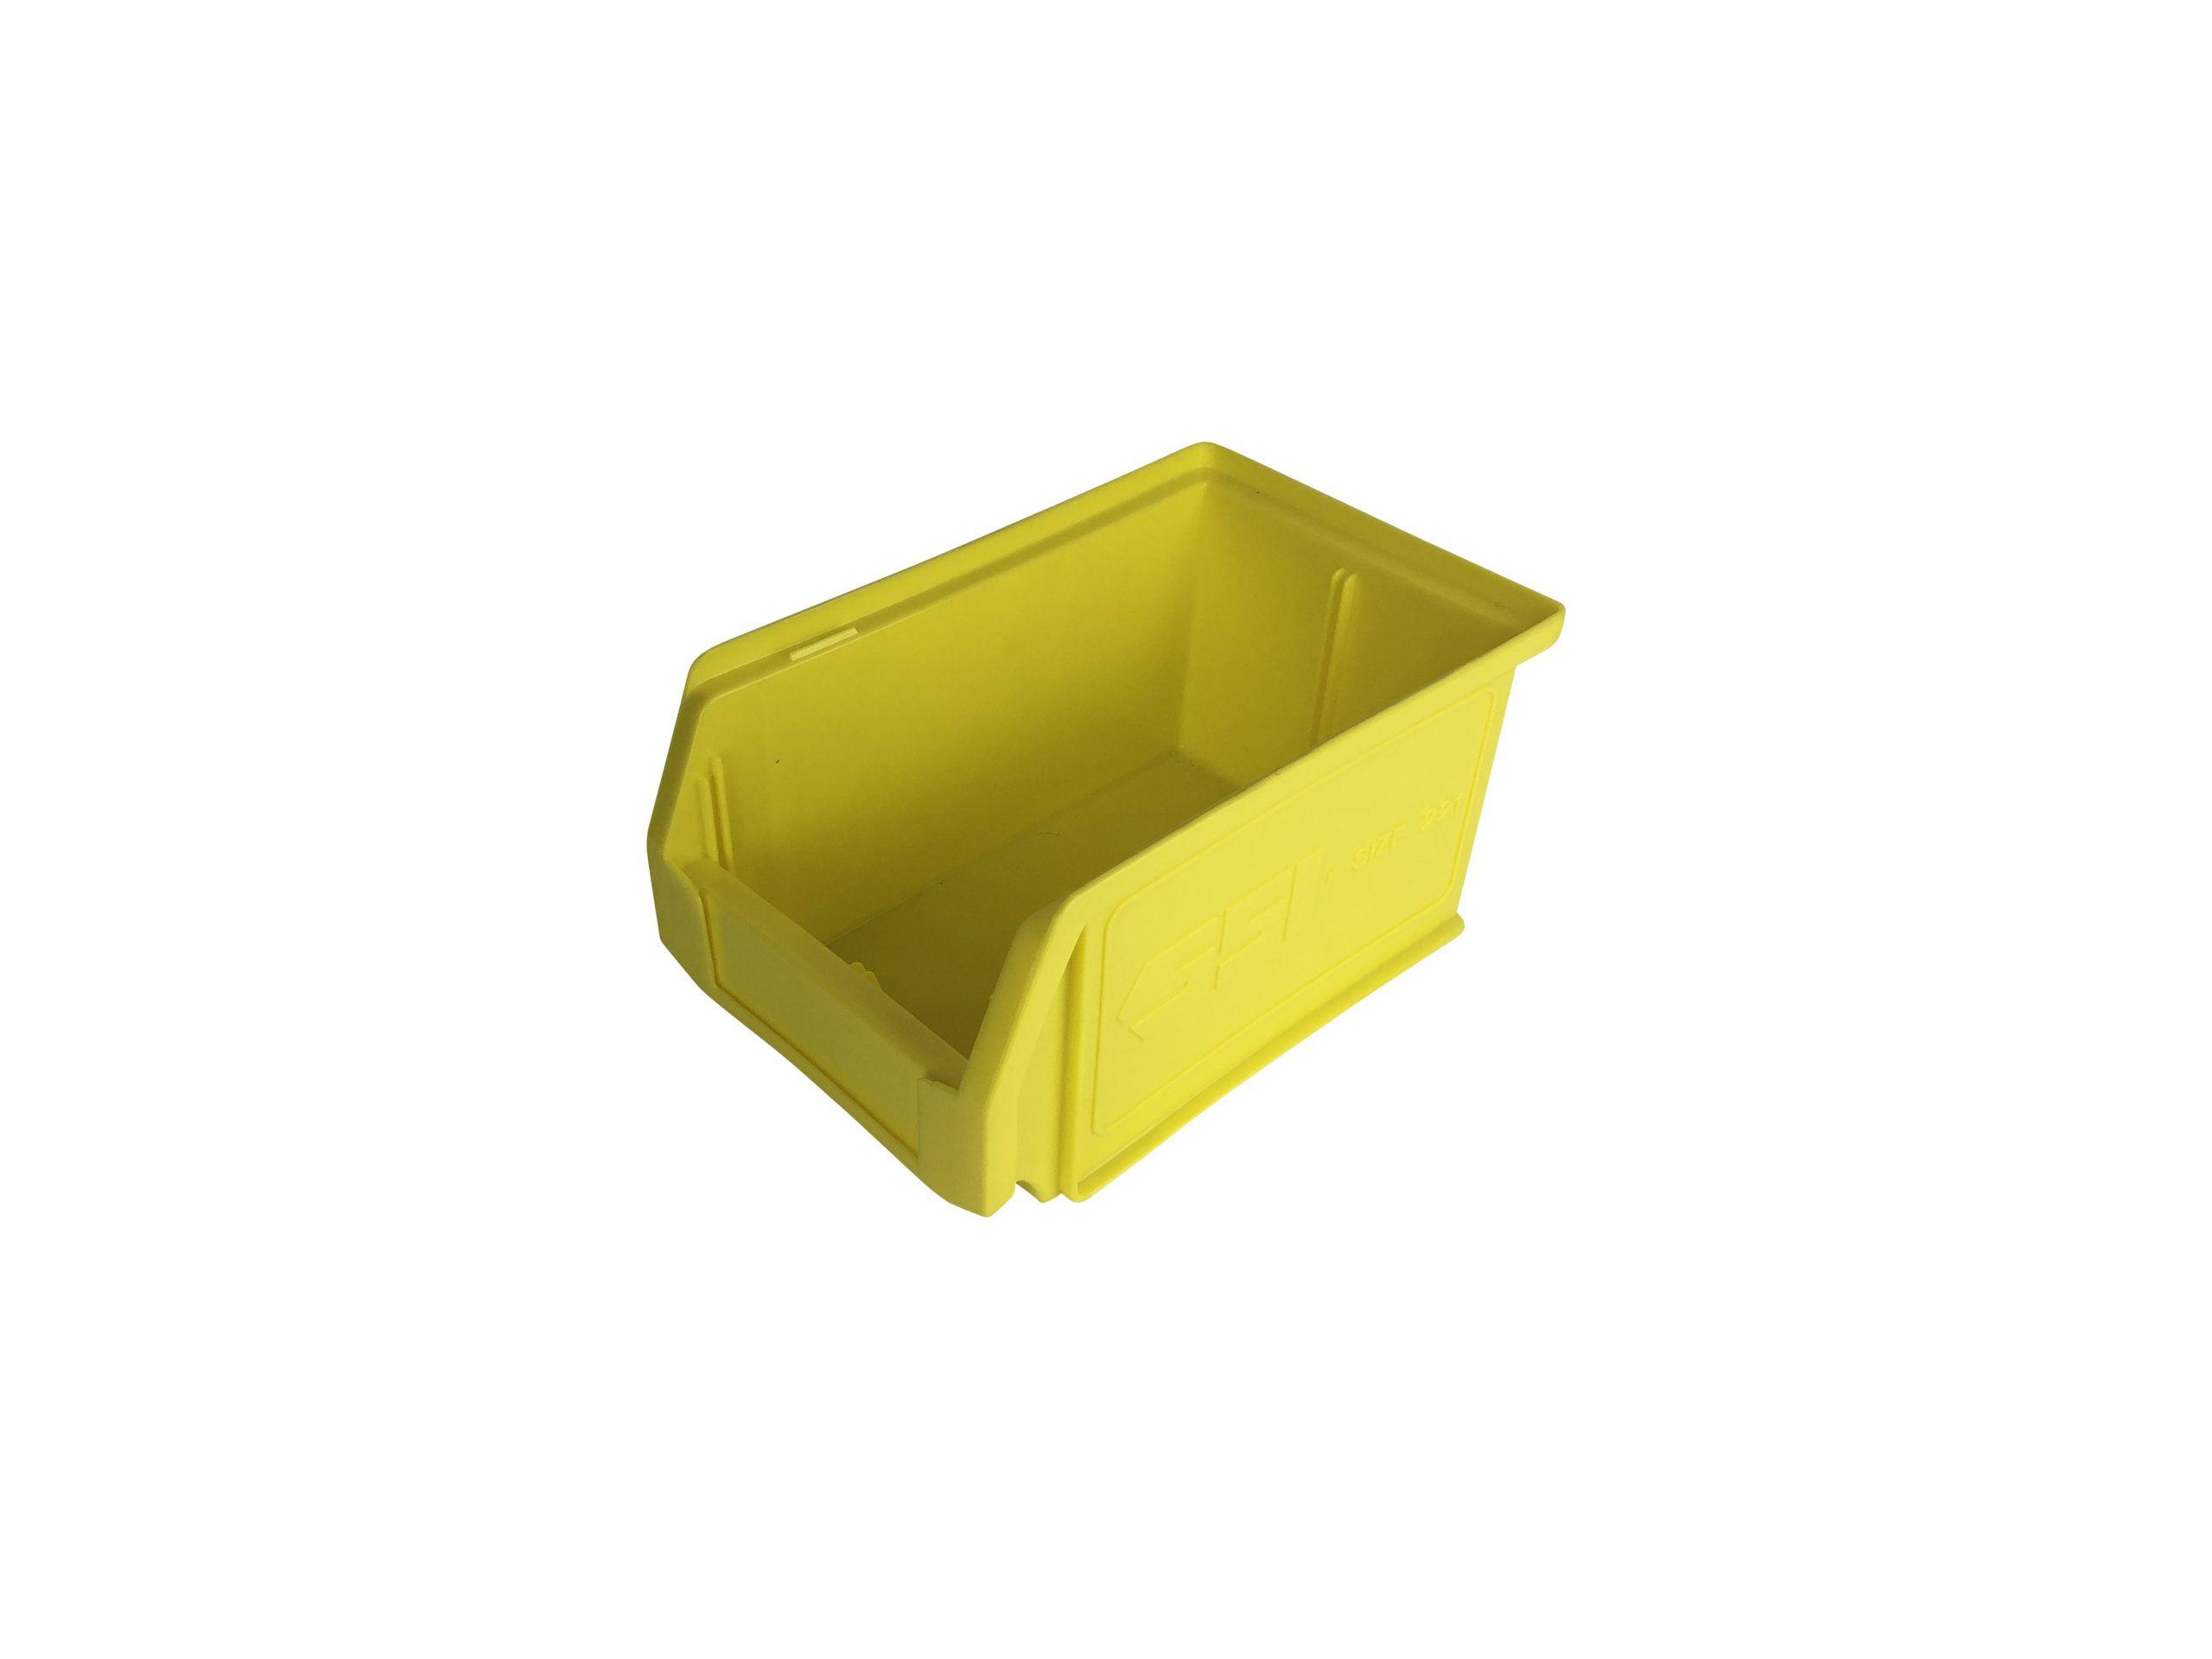 LF221 plastic storage containers